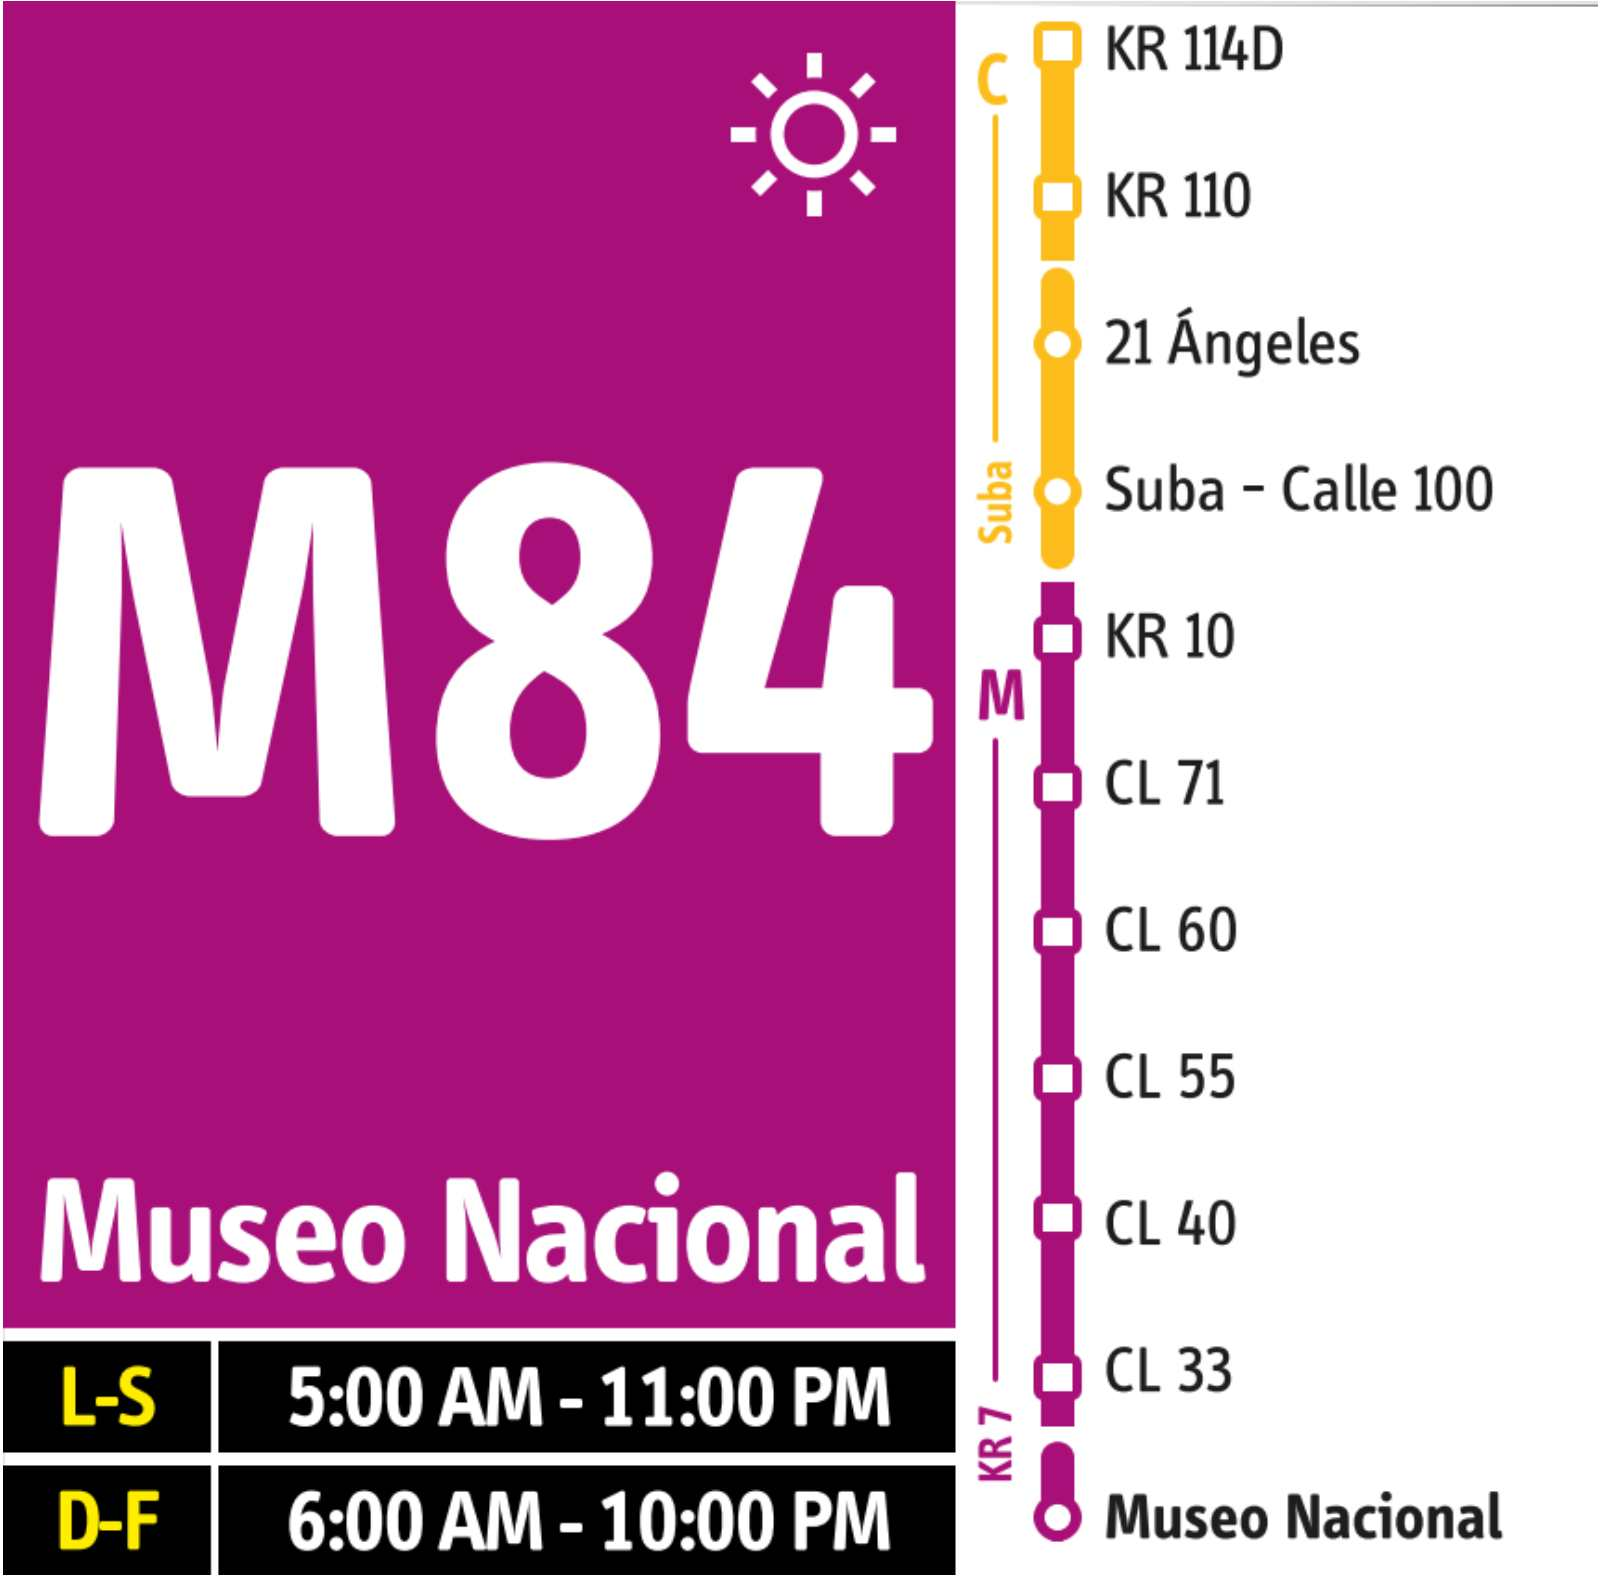 M84-C84 >Museo Nacional- ETB Tibabuyes - (dual)